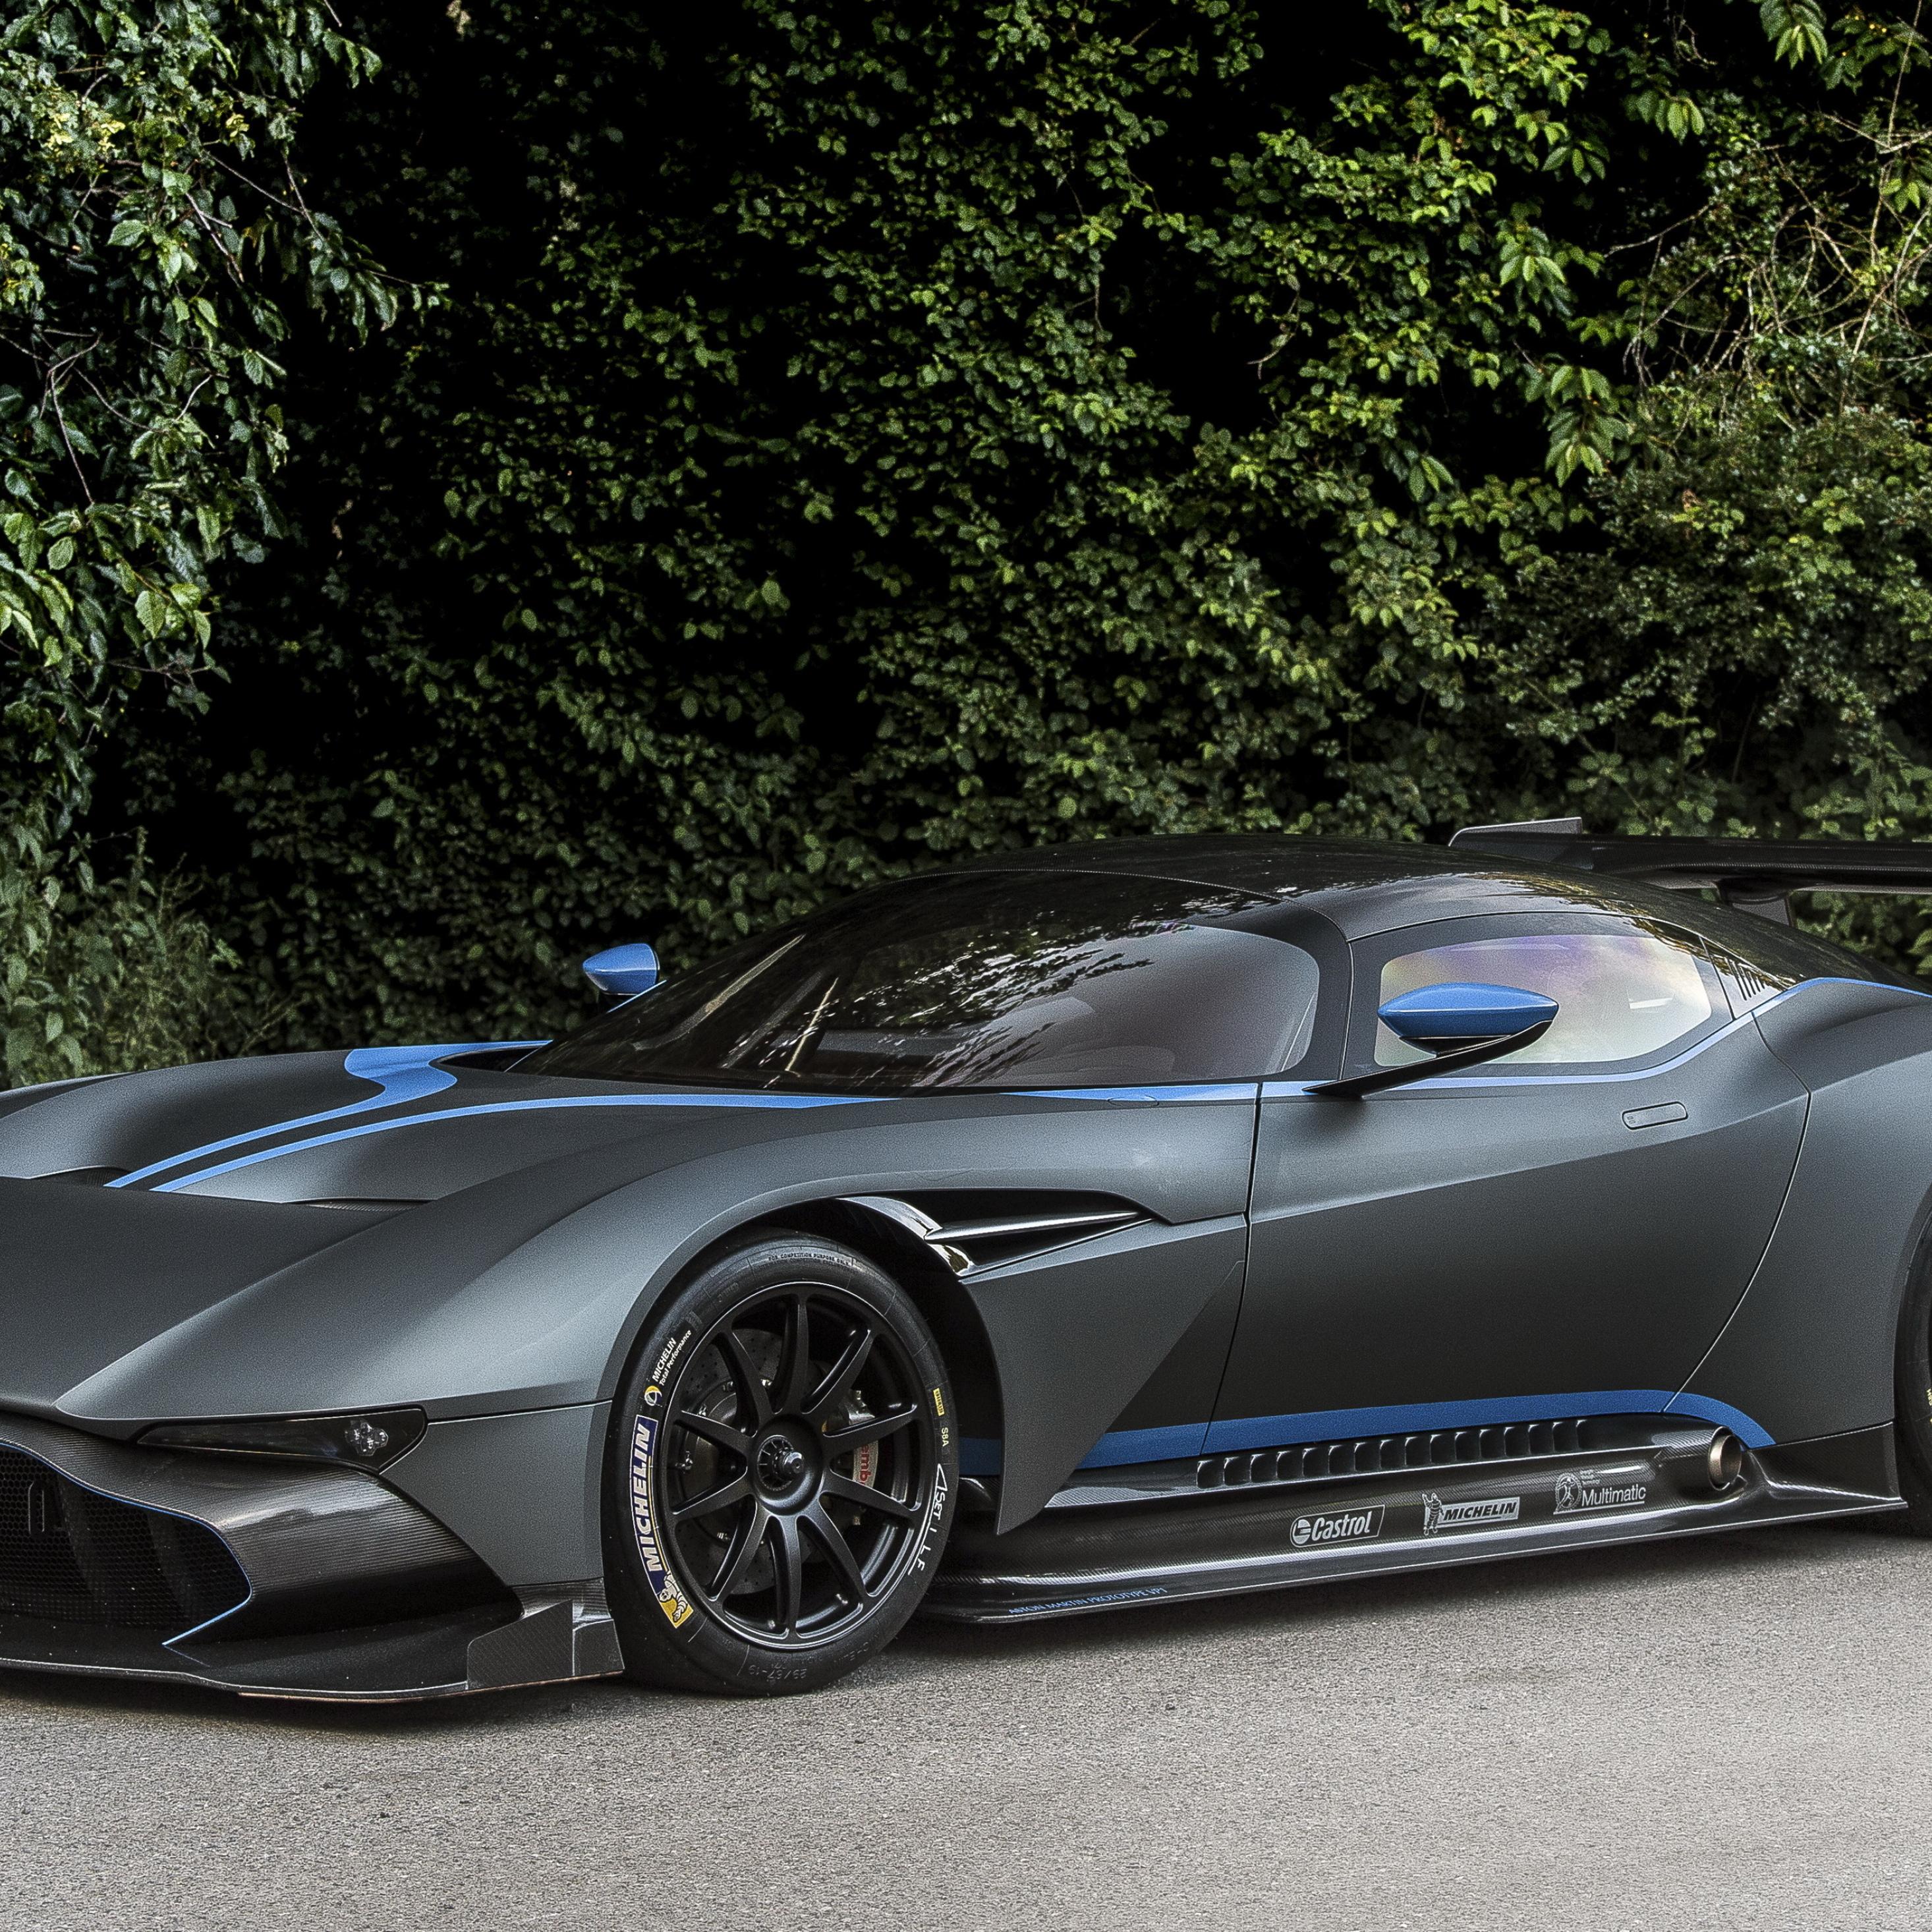 Aston Martin Car Wallpaper: Aston Martin, Vulcan, Side View, HD 4K Wallpaper